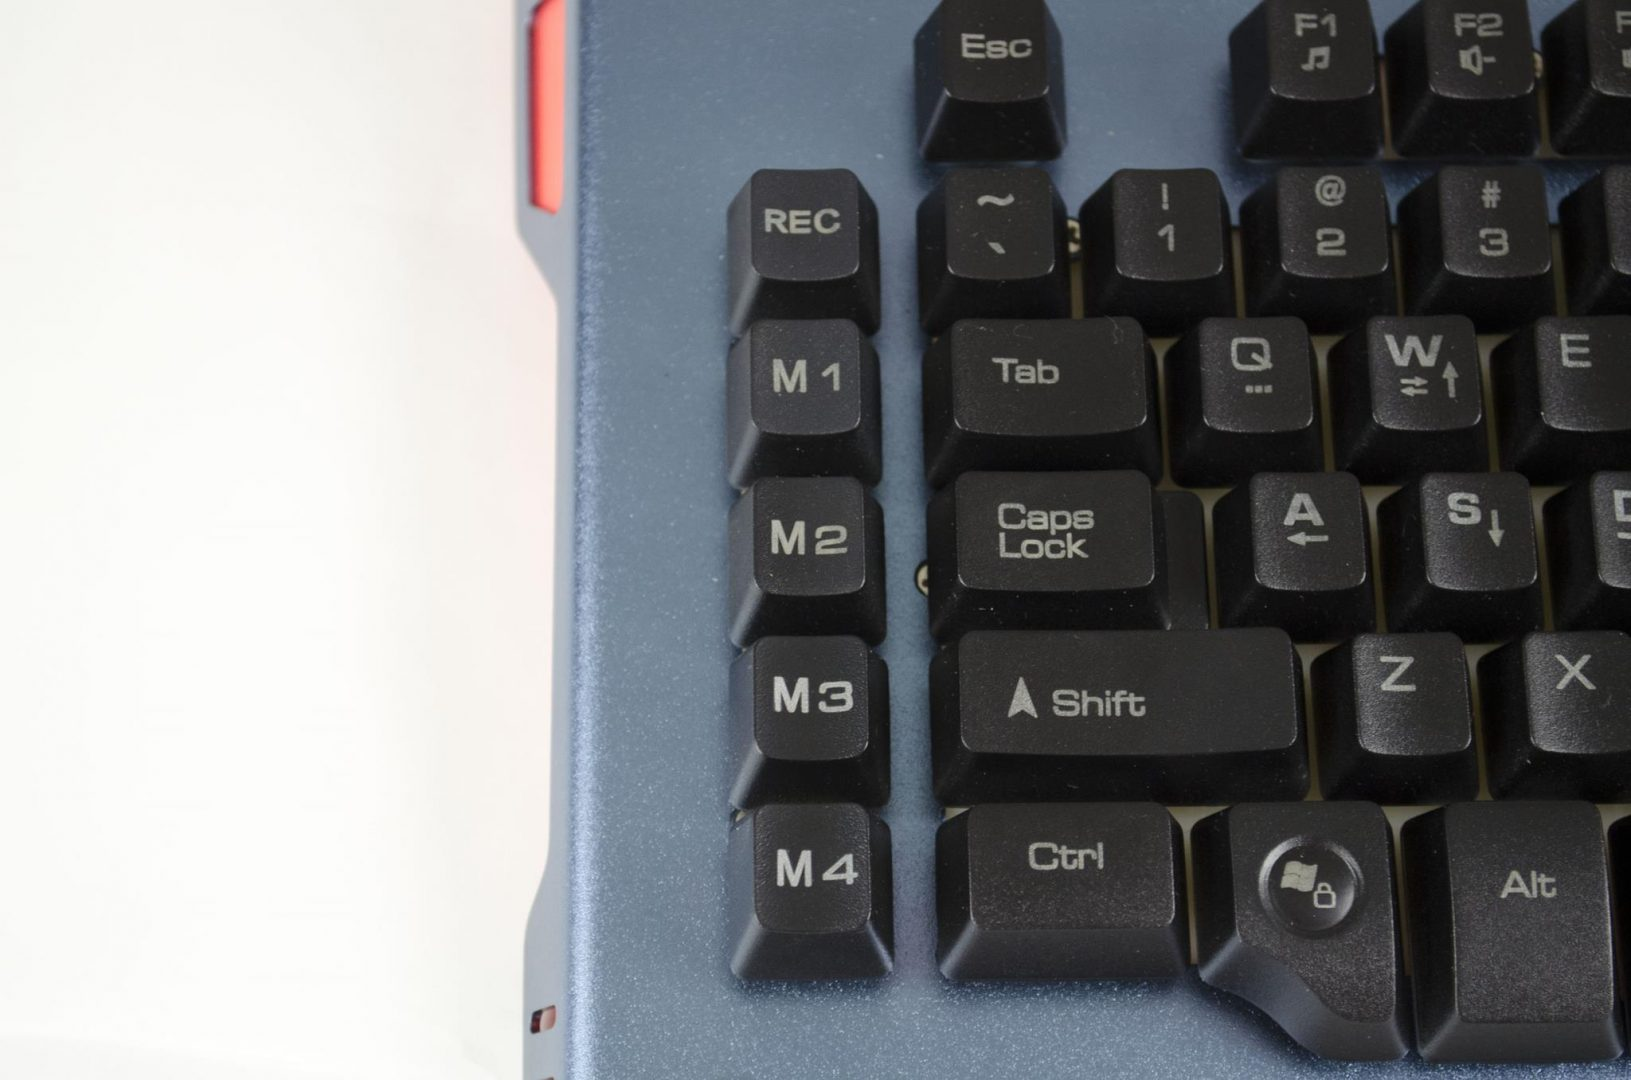 Azolt gCrusayder keyboard review_7